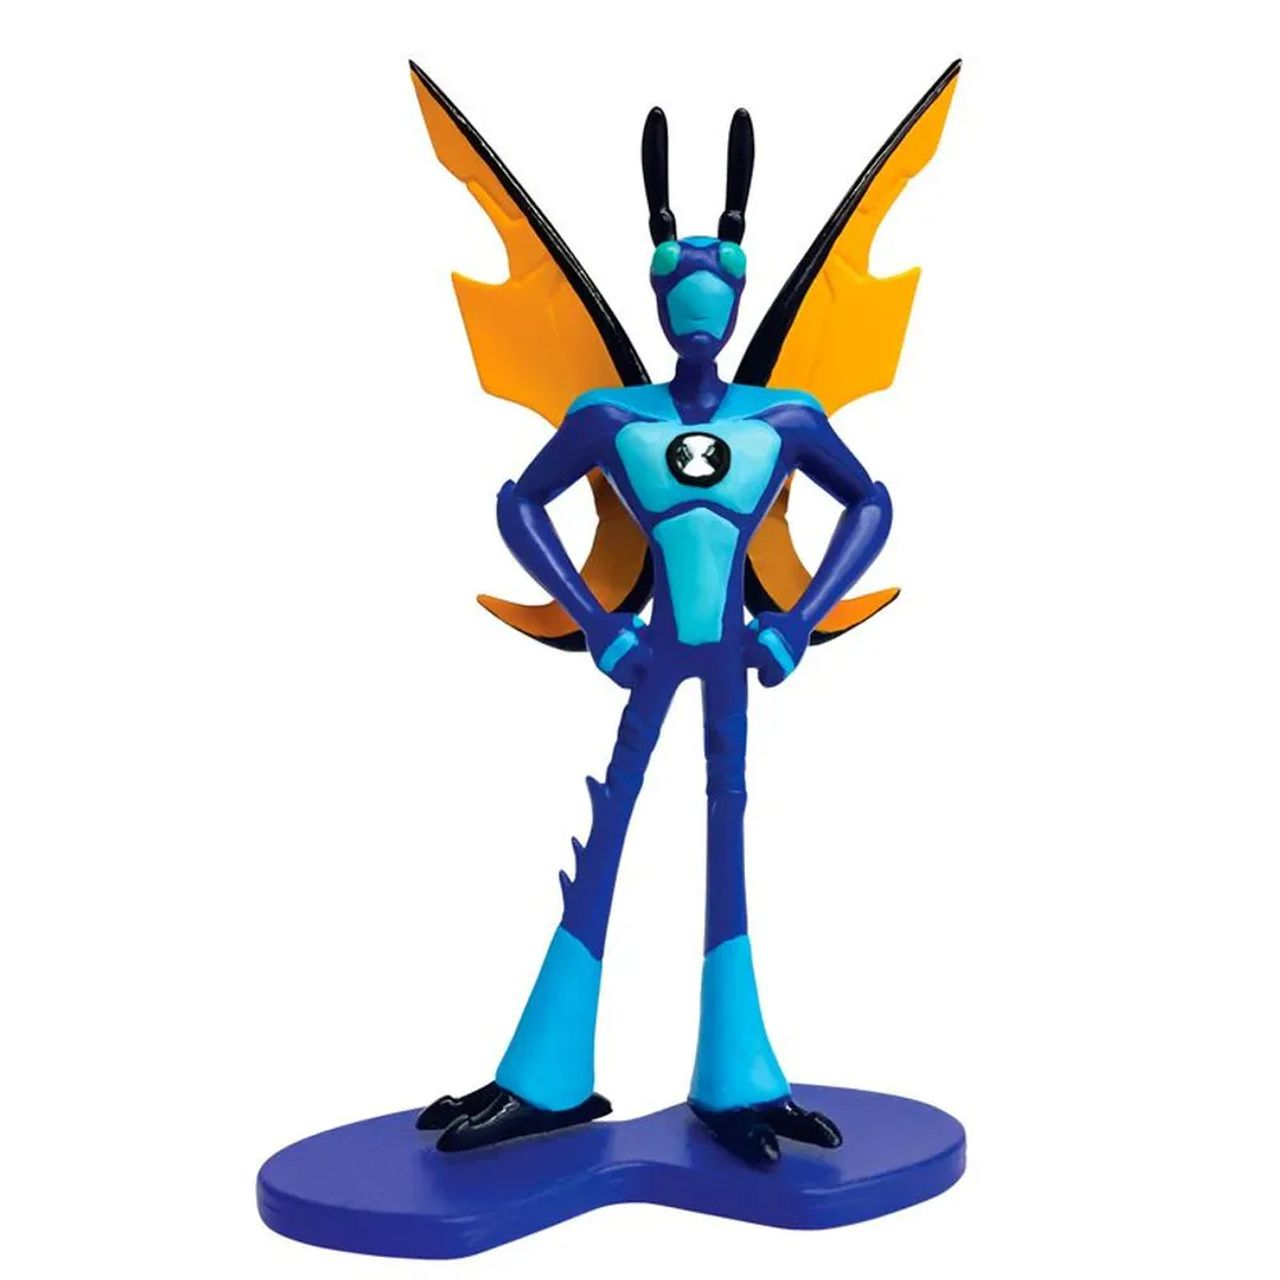 Mini Figuras Ben 10 - Boneco Insectóide - Original Sunny